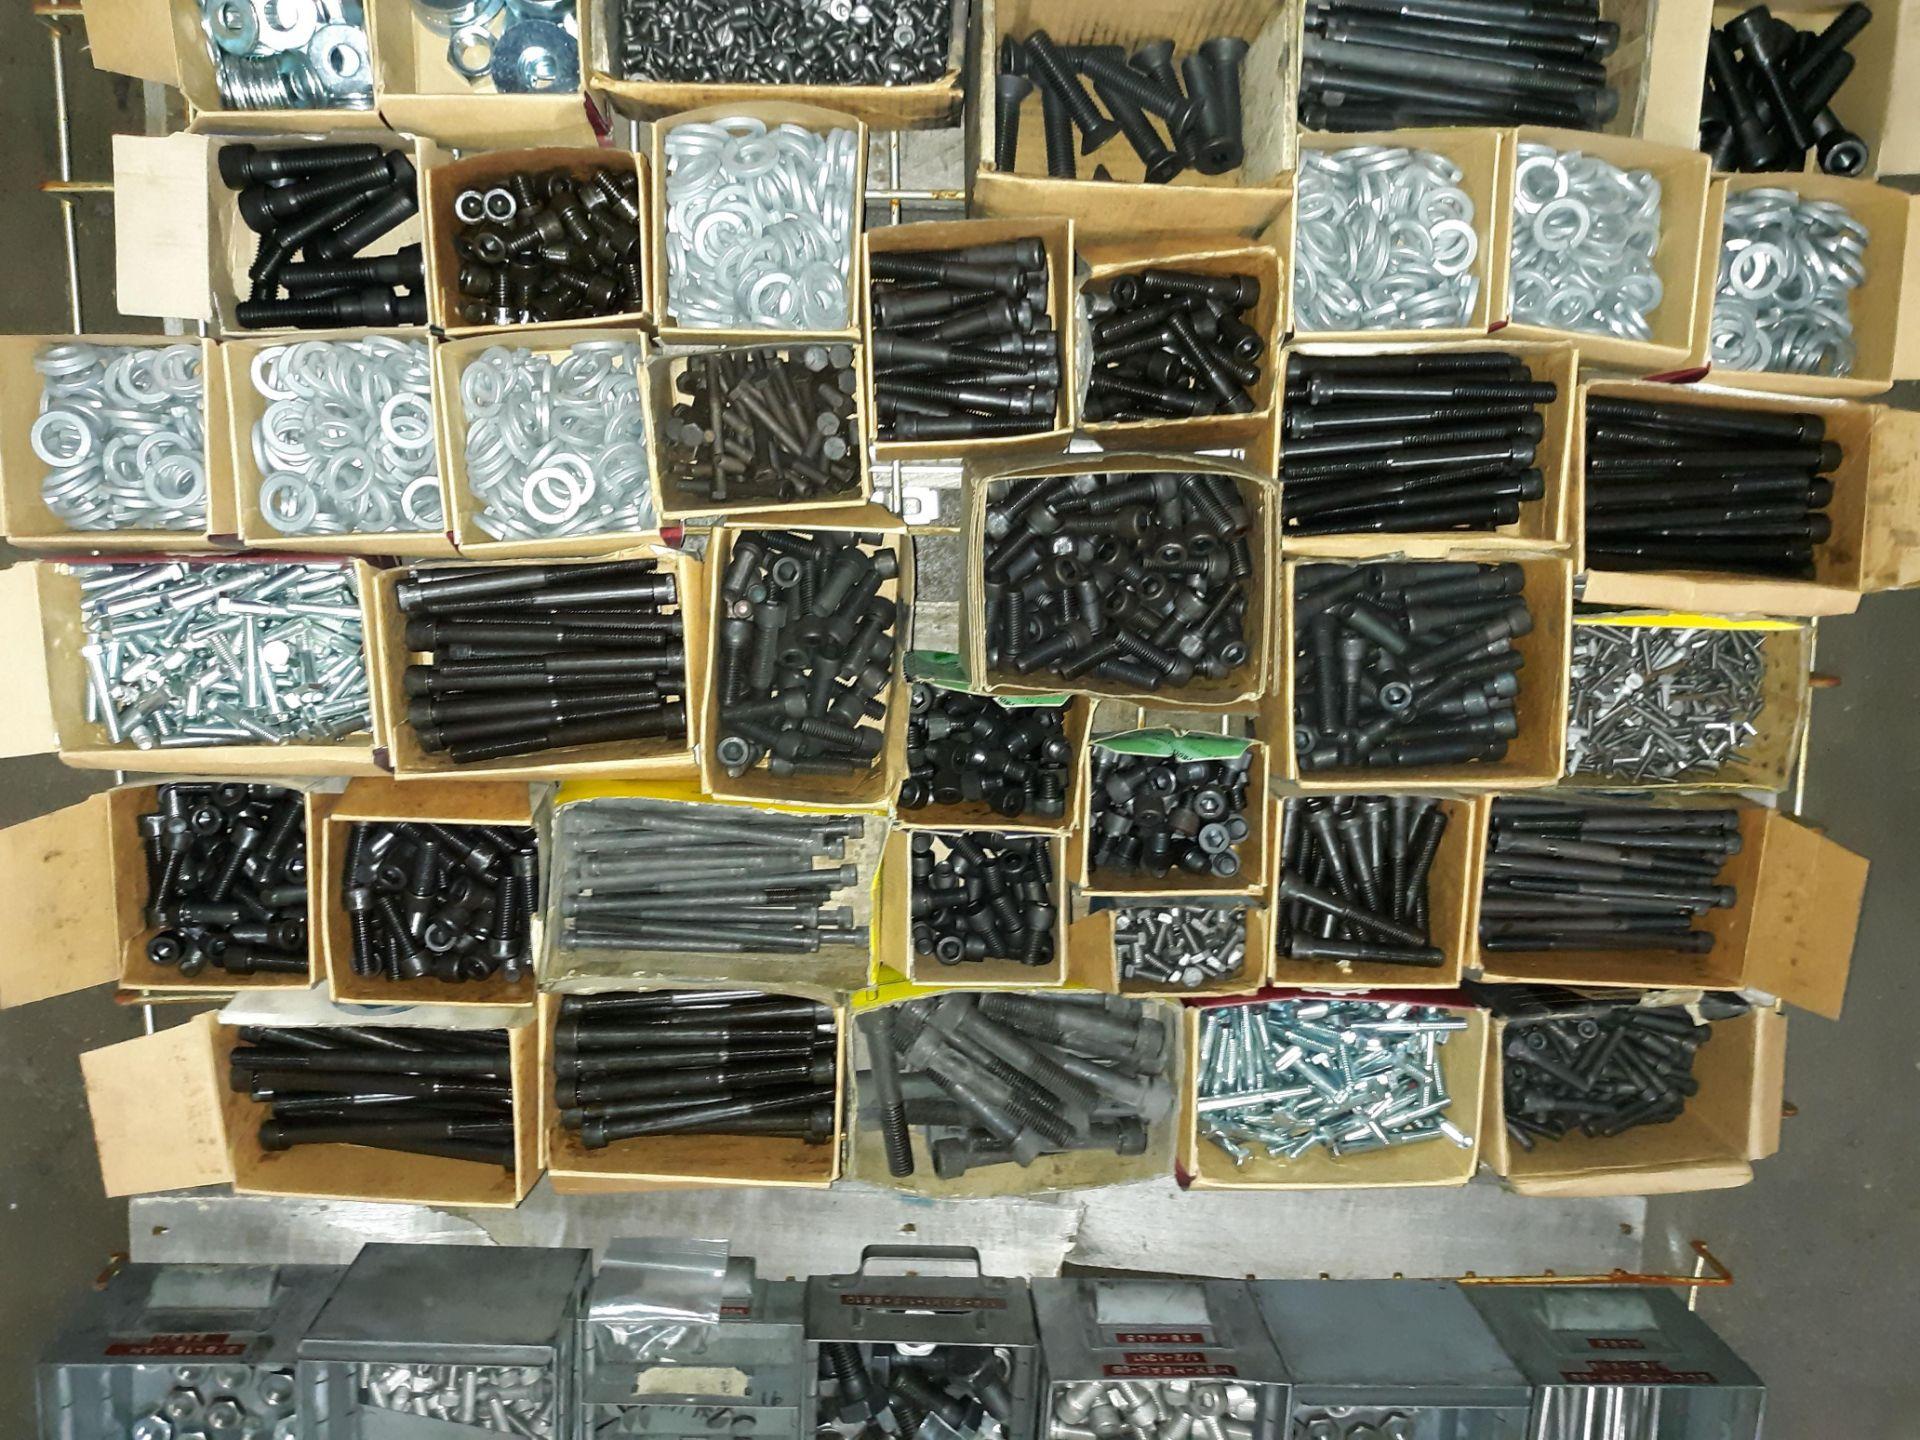 Lot 1066 - PALLET OF VARIOUS HEX SOCKET CAP SCREW GRADE 5 CAP SCREW & HEX NUTS & WASHERS (LOCATED AT: 432